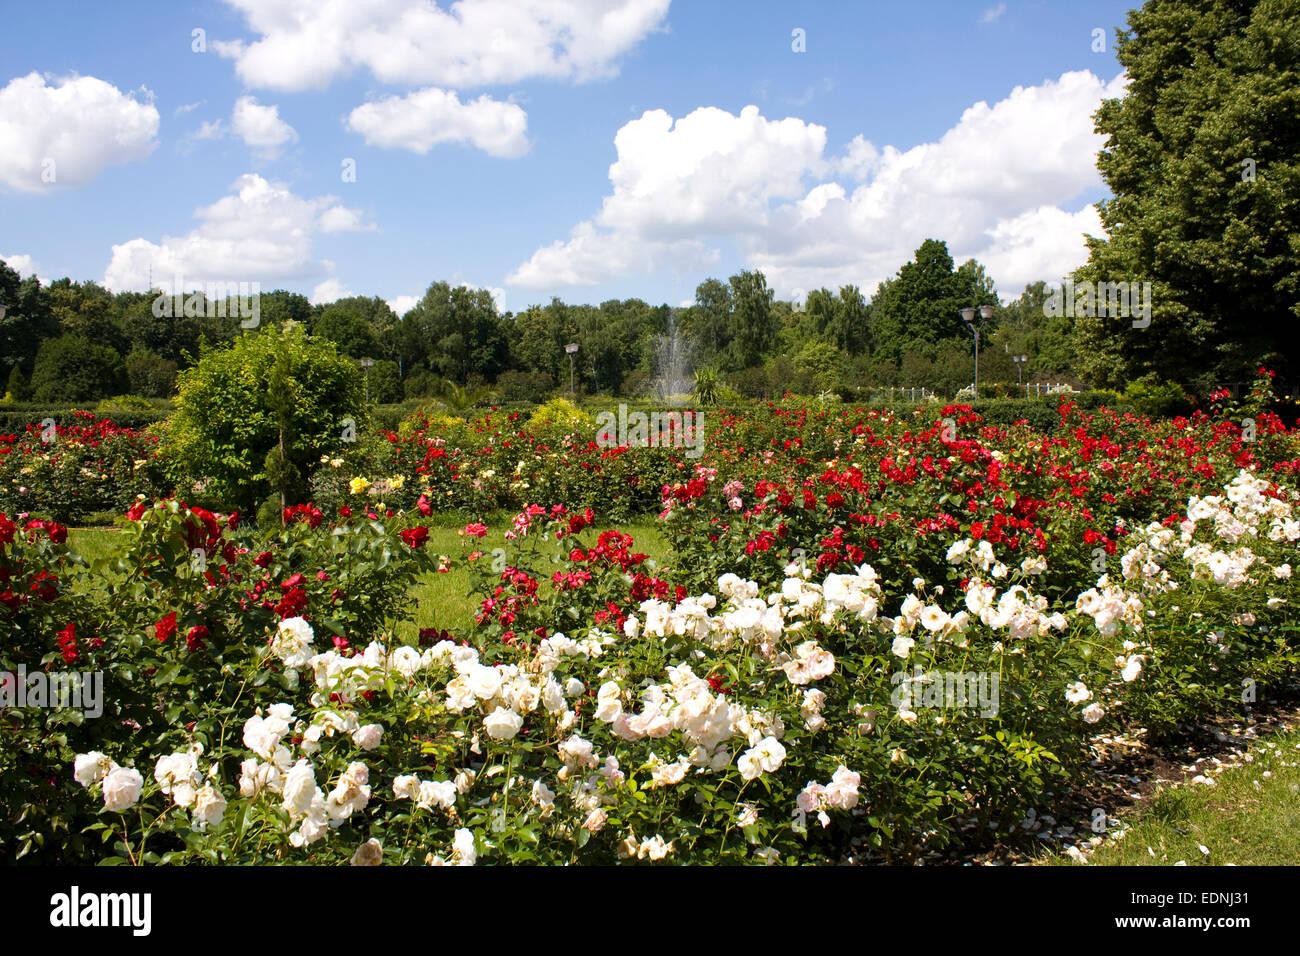 Rose Garden Park Stock Photos & Rose Garden Park Stock Images - Alamy